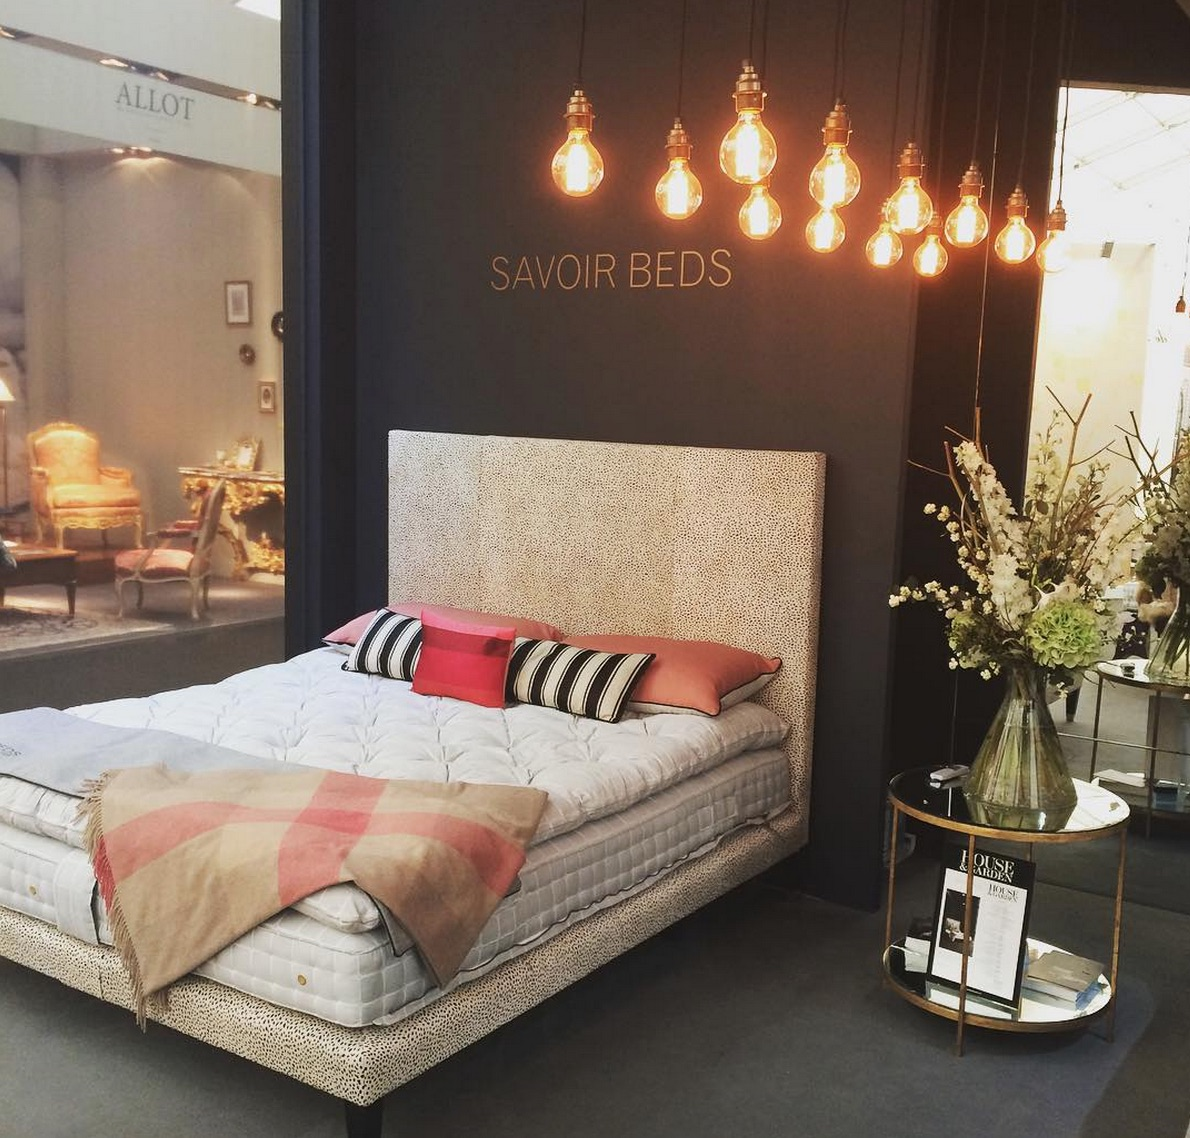 Savoir Beds - Decorex 2015 - 1